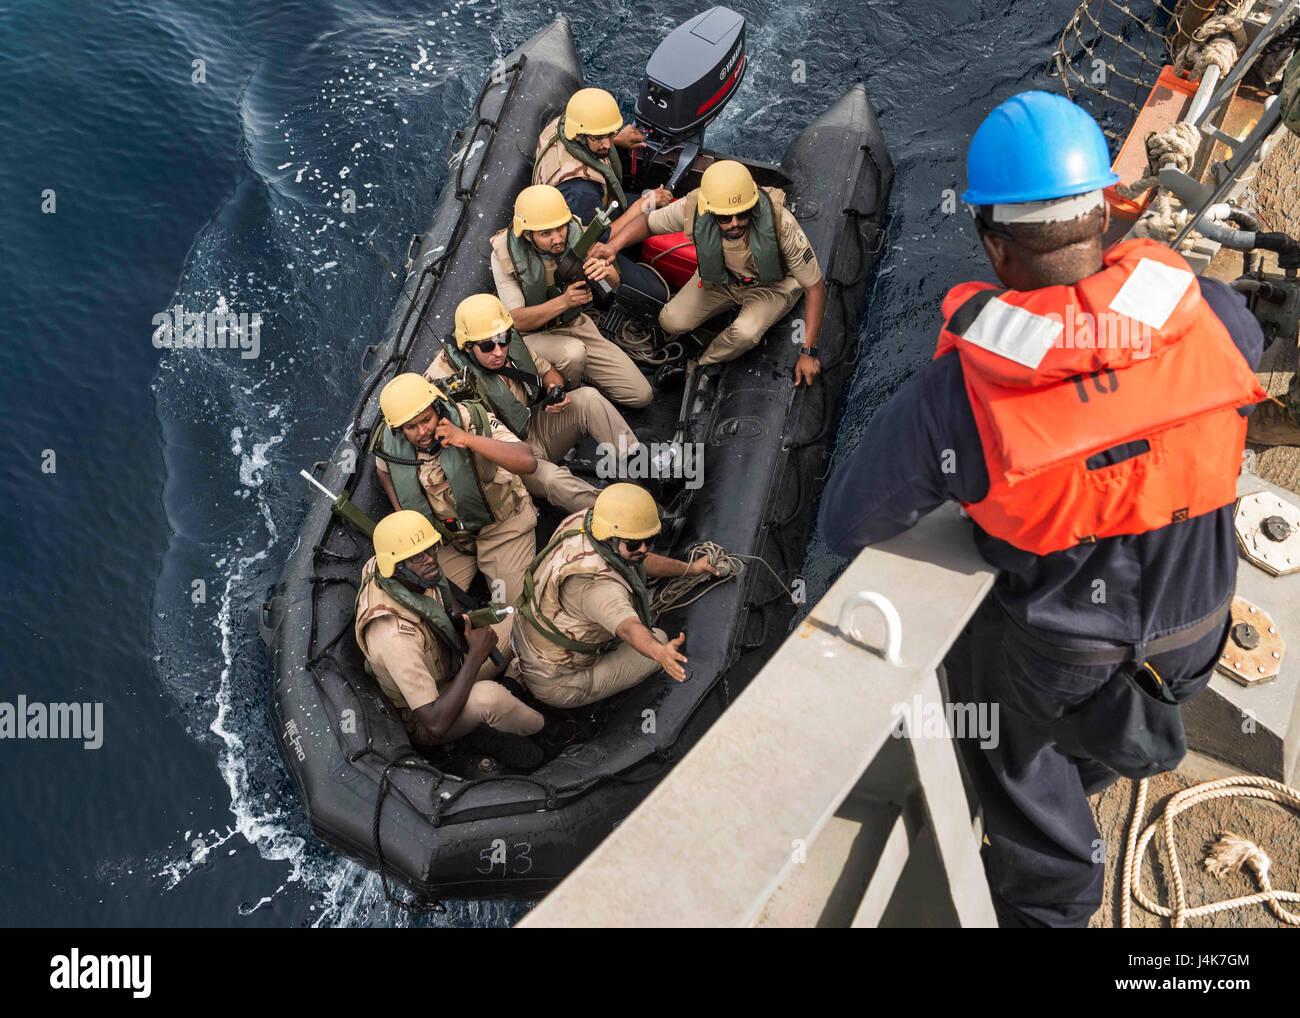 ARABIAN GULF (May 3, 2017) Royal Saudi Navy Sailors pull alongside USS Mahan (DDG 72) as they prepare to board the - Stock Image